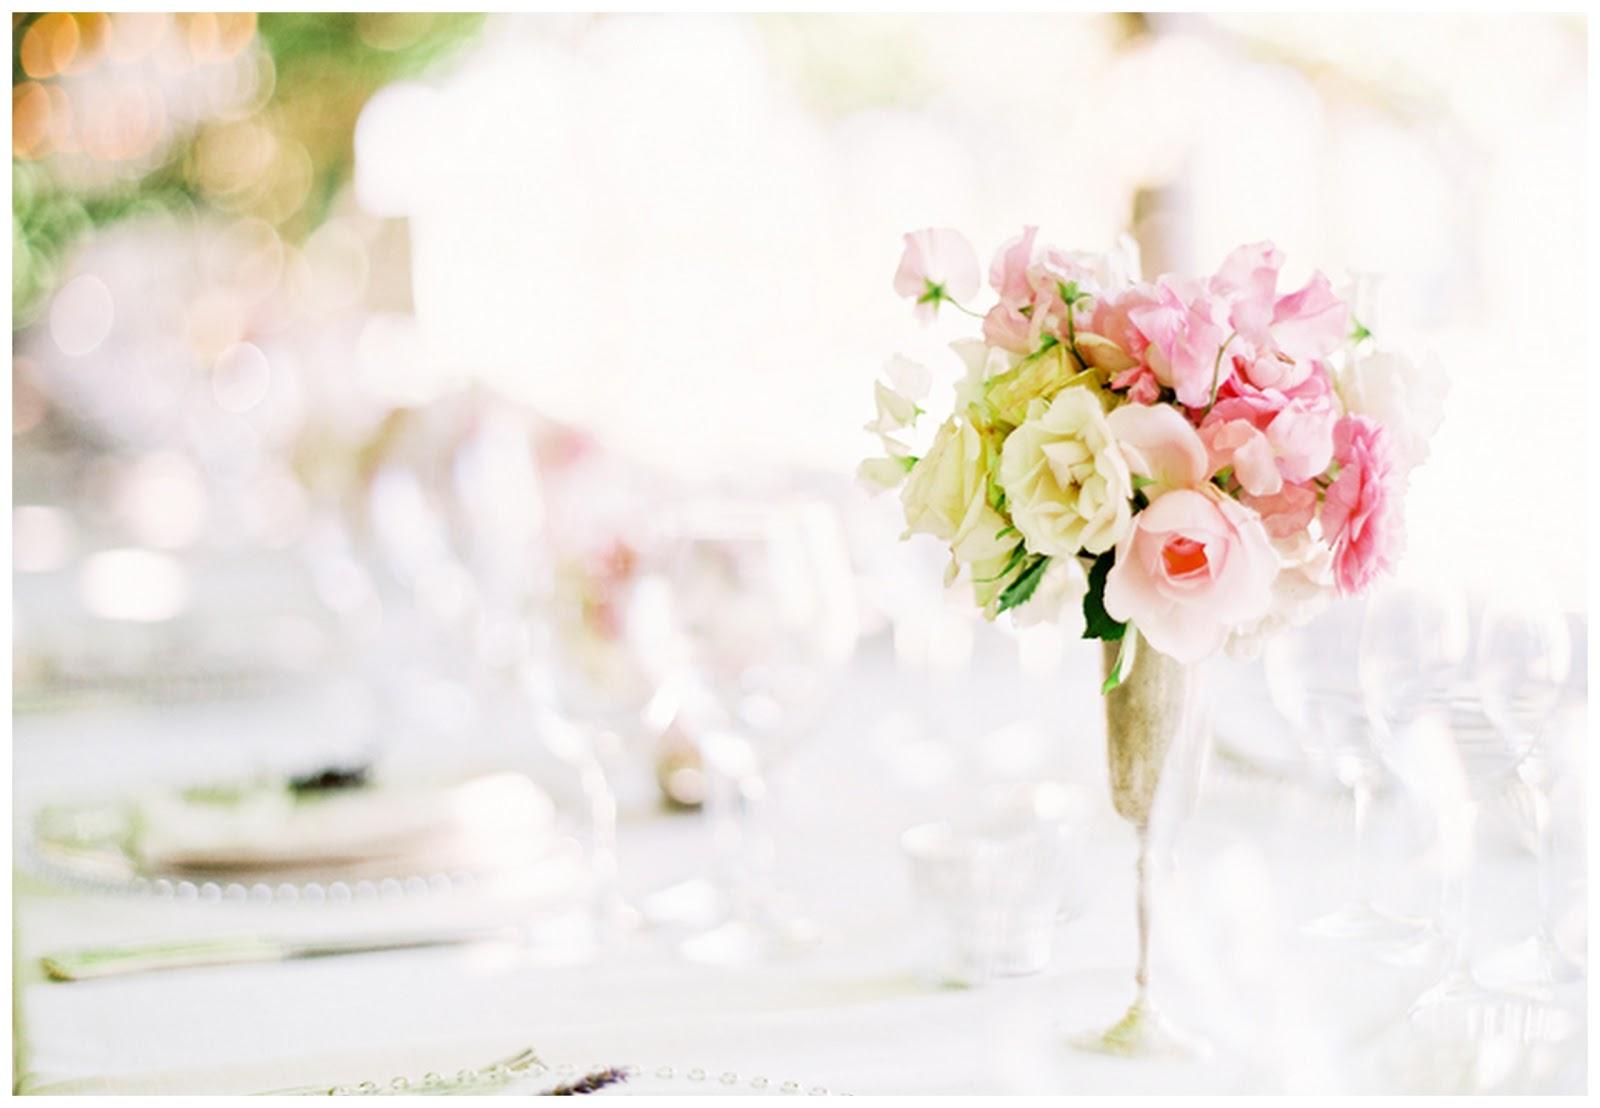 Wedding Flowers By Season 26 Trend Wednesday February